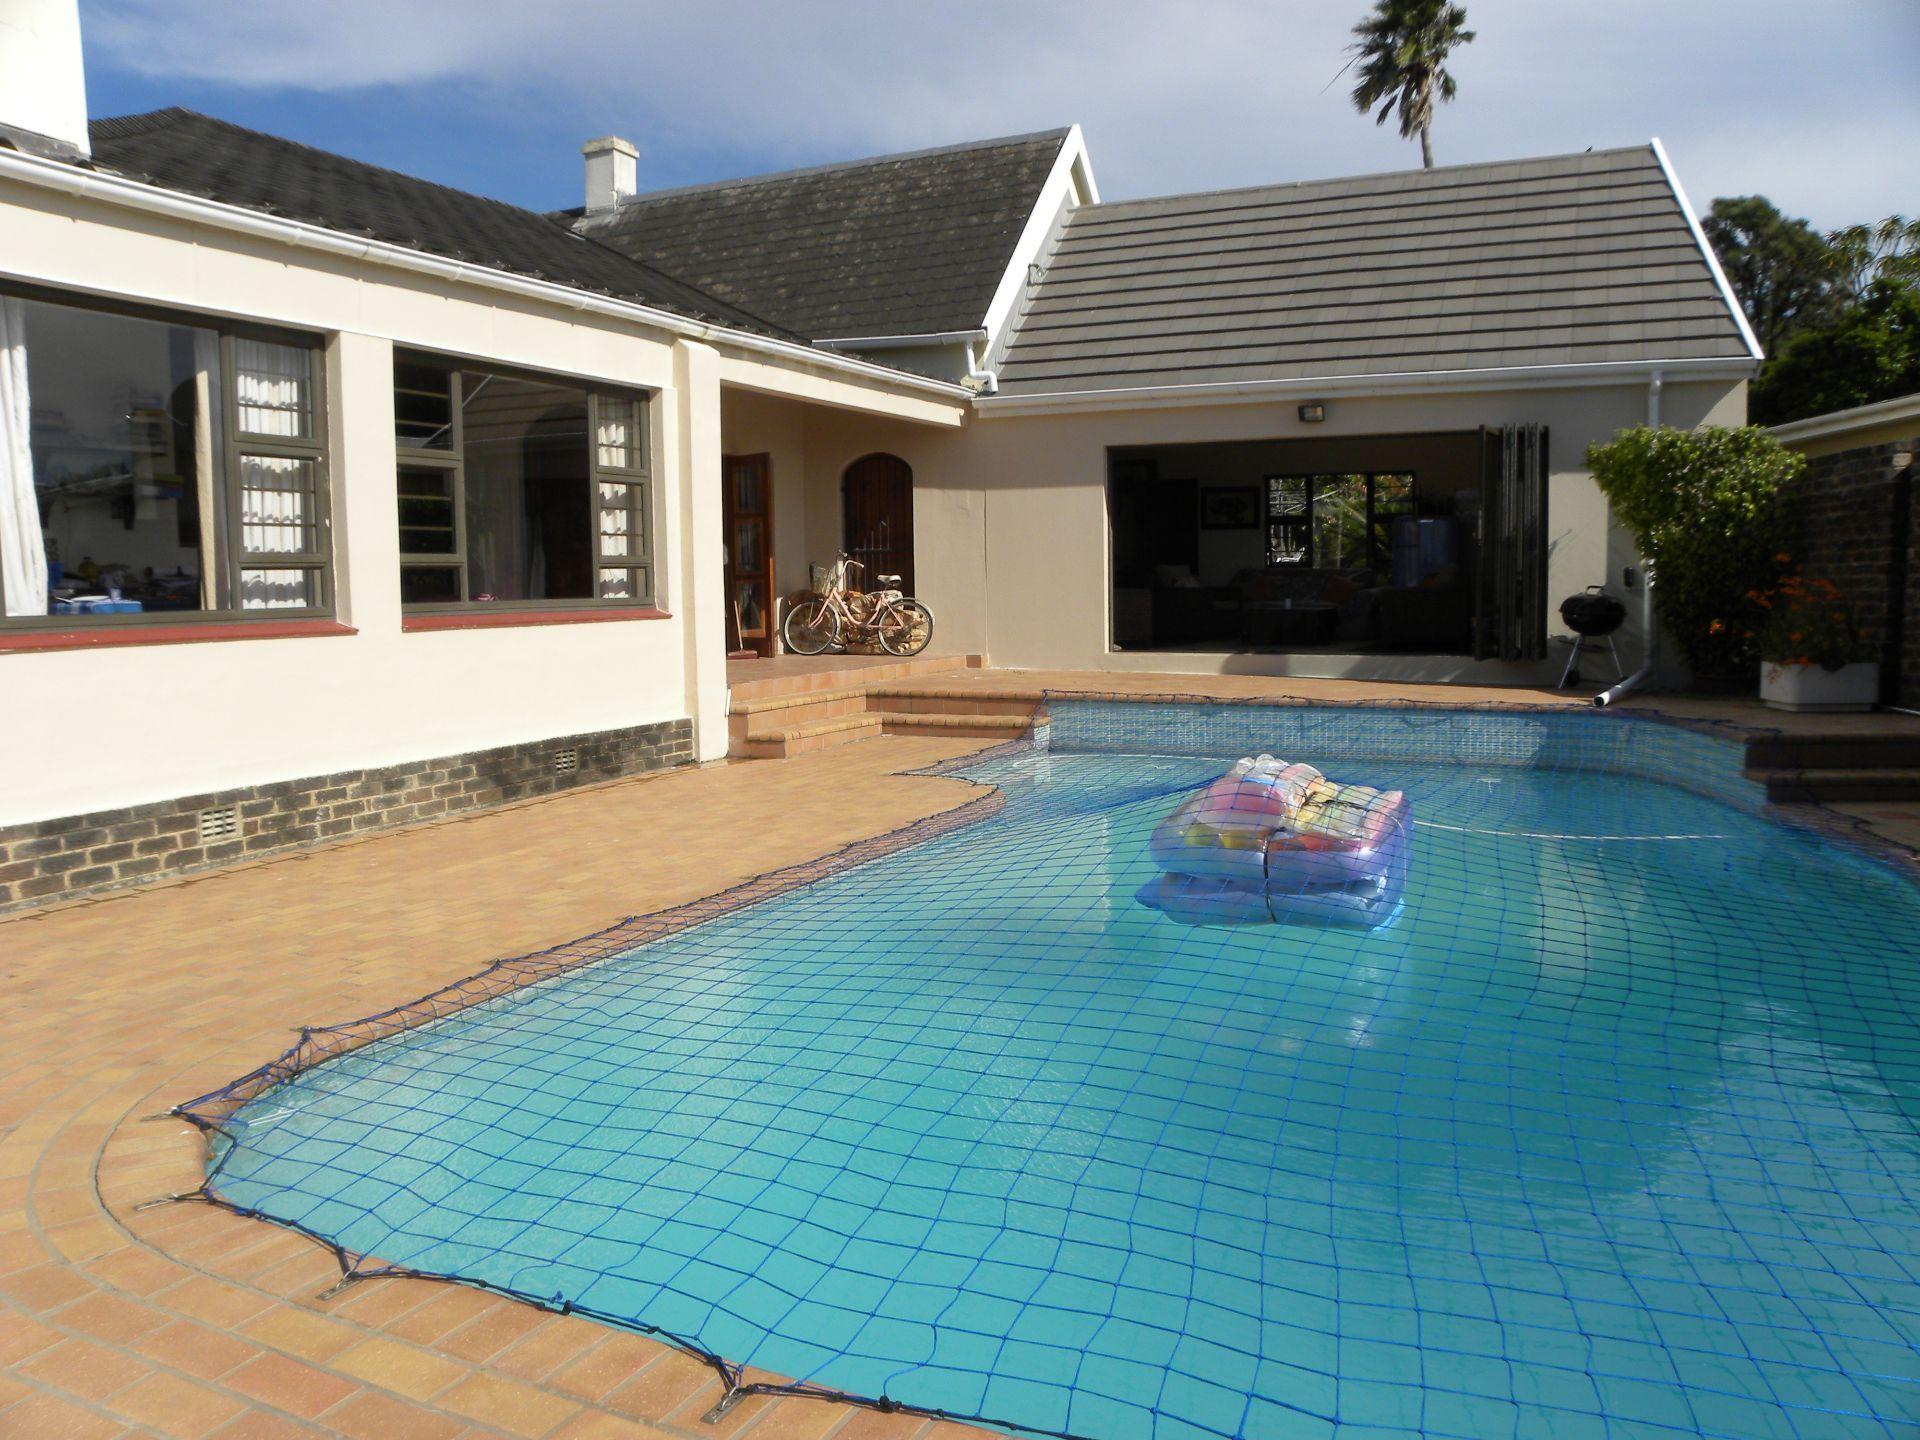 Bonnie Doone property for sale. Ref No: 13229687. Picture no 7